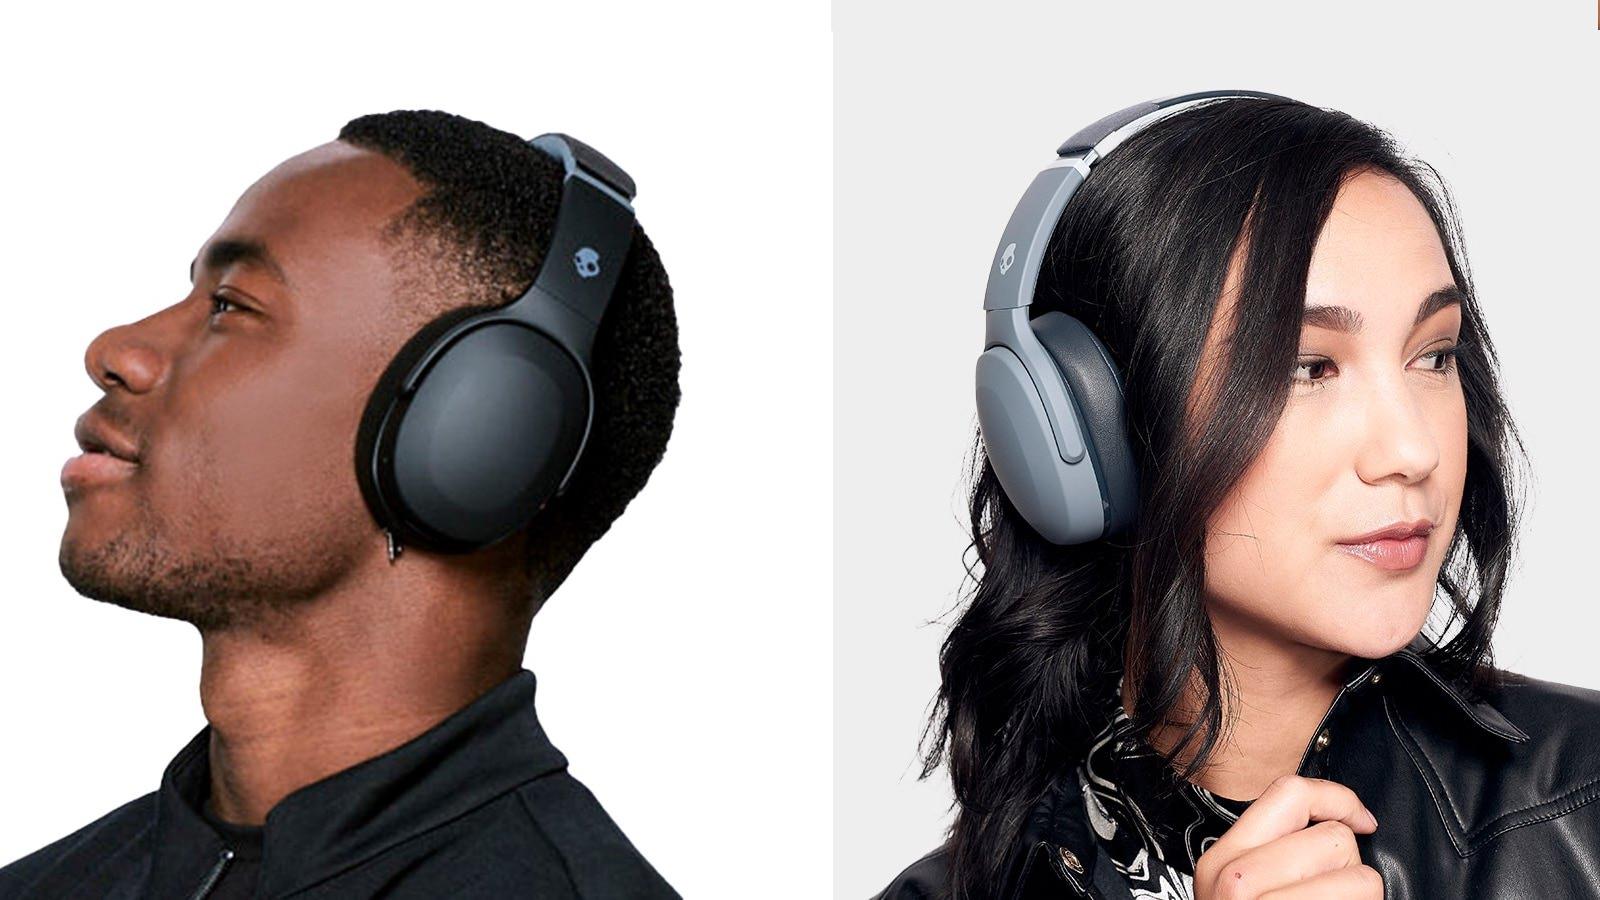 Skullcandy Crusher Evo Wireless Headphones in True Black and Chill Grey